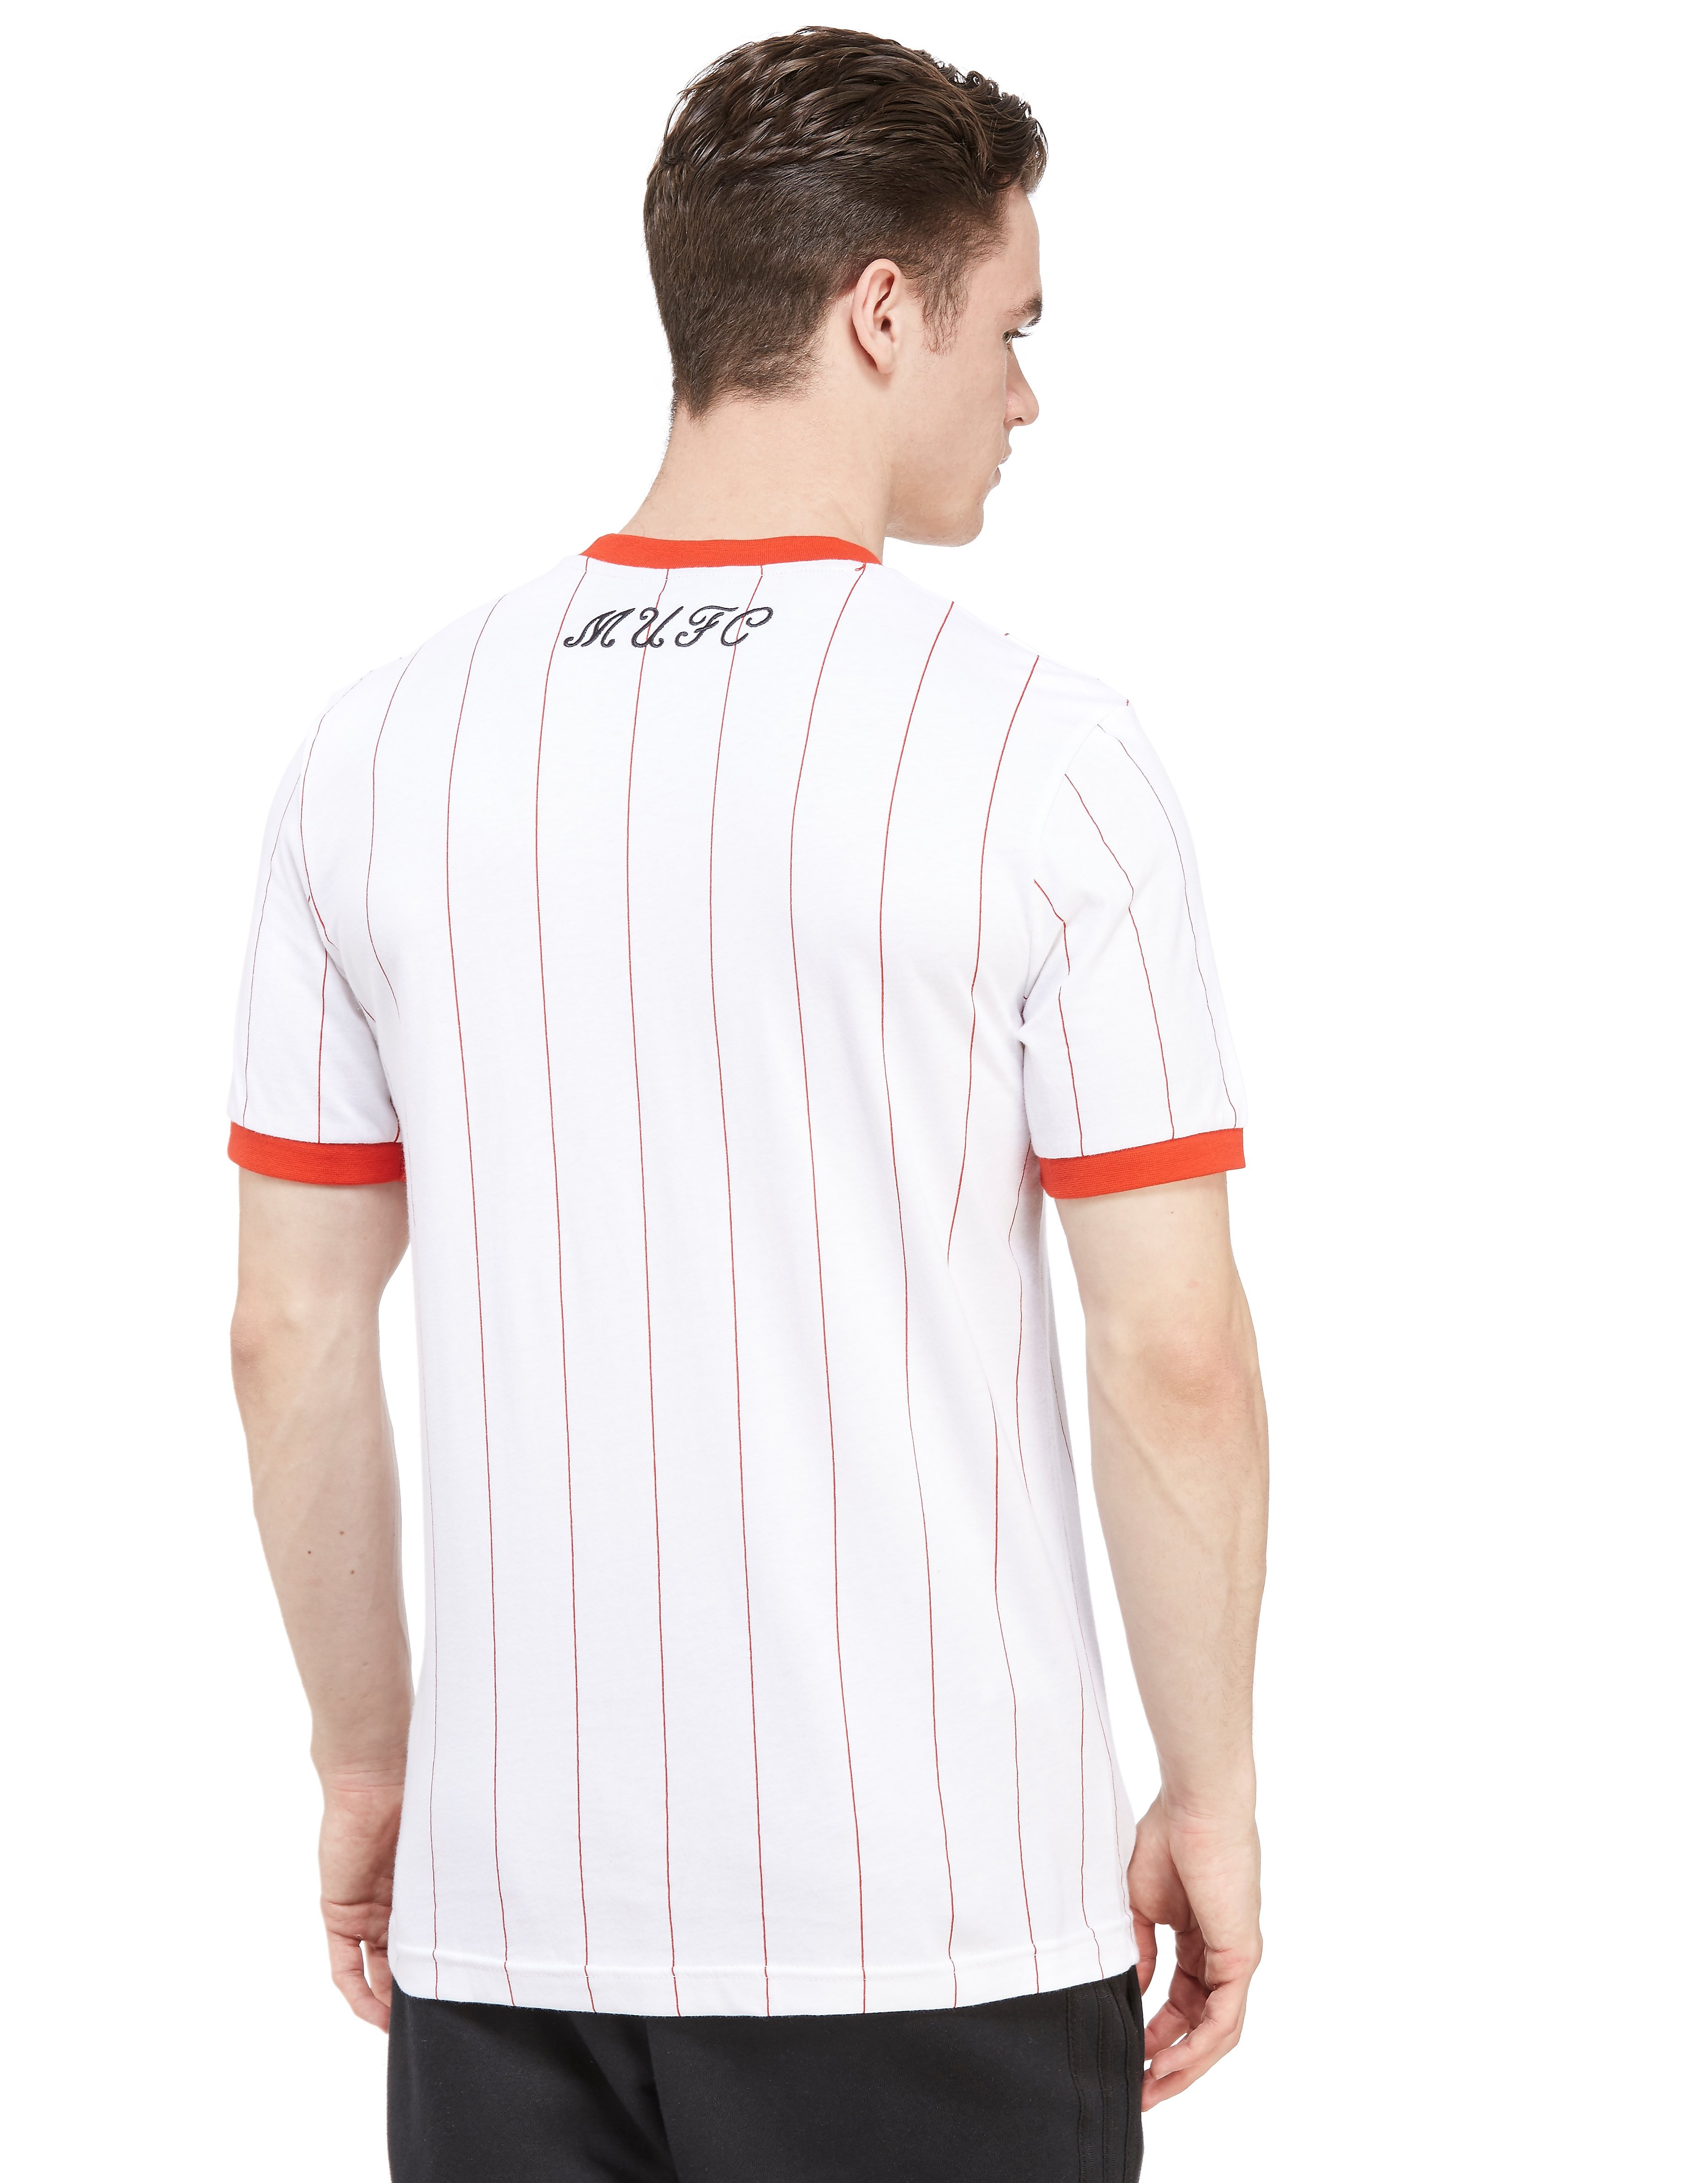 adidas Originals Manchester United FC Pinstripe T-Shirt